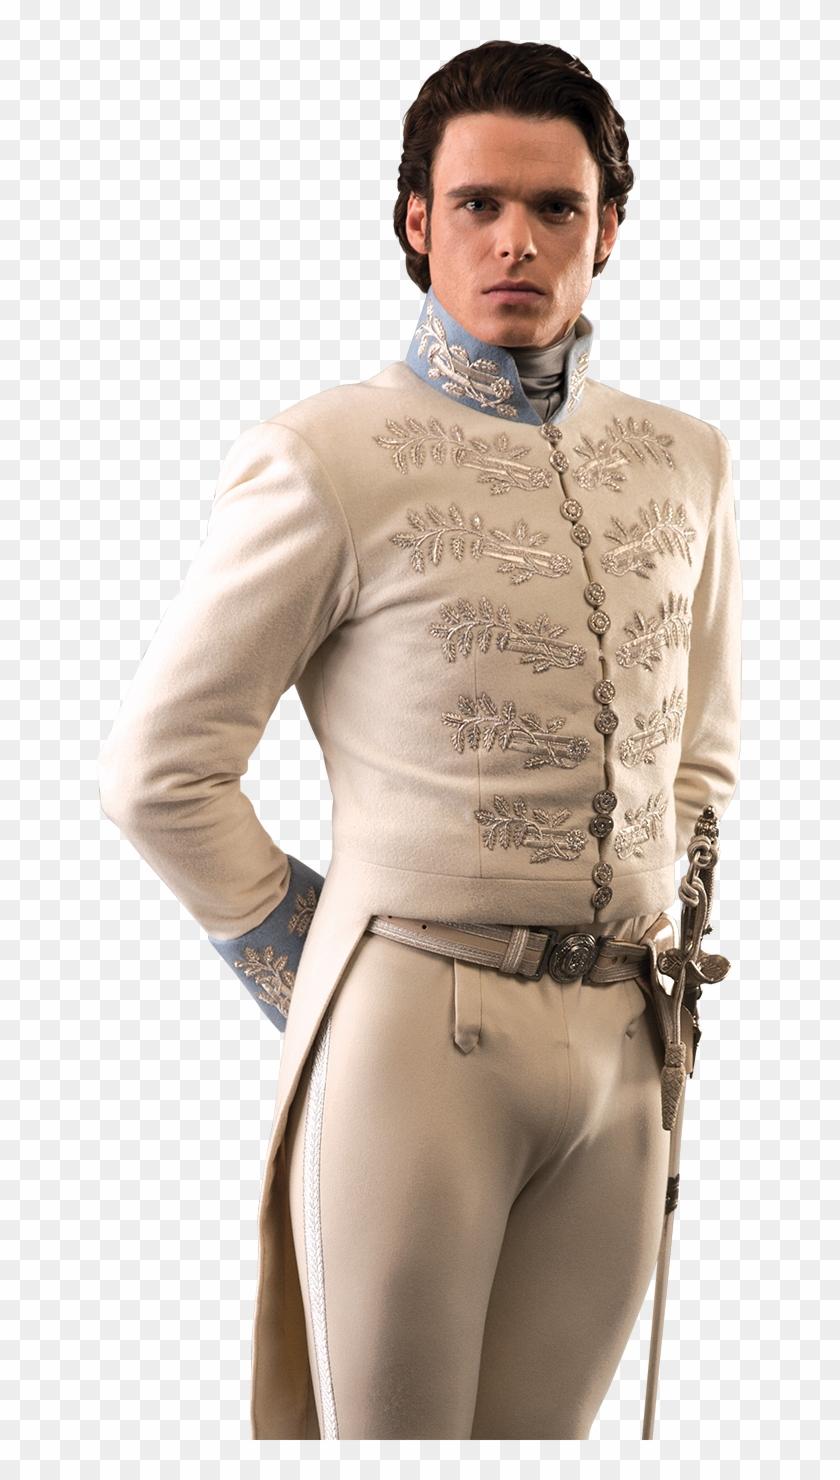 Richard Madden - Richard Madden Cinderella Bulge #396094